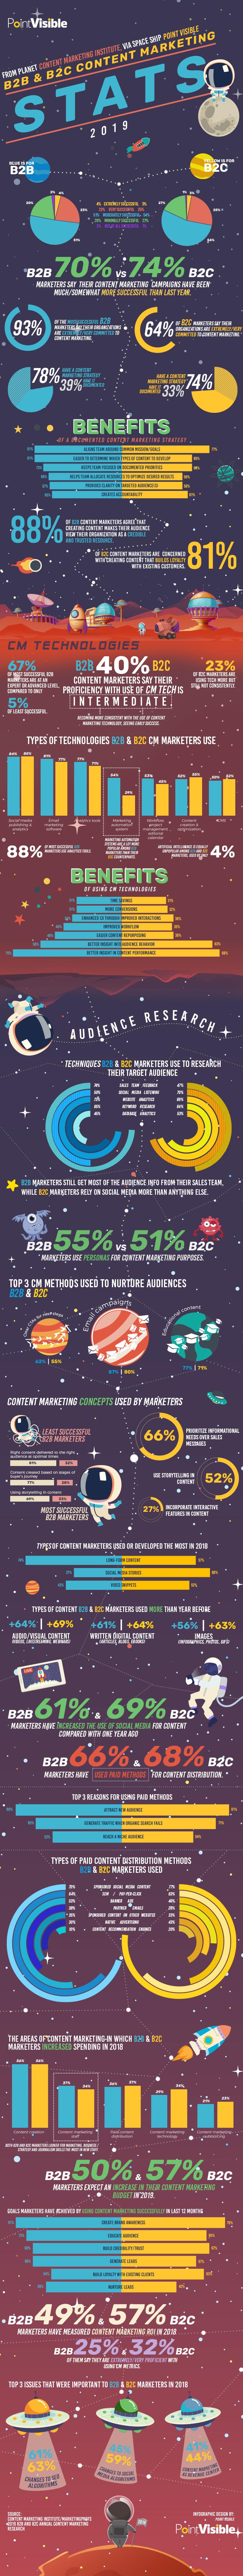 B2B & B2C Content Marketing Stats 2019